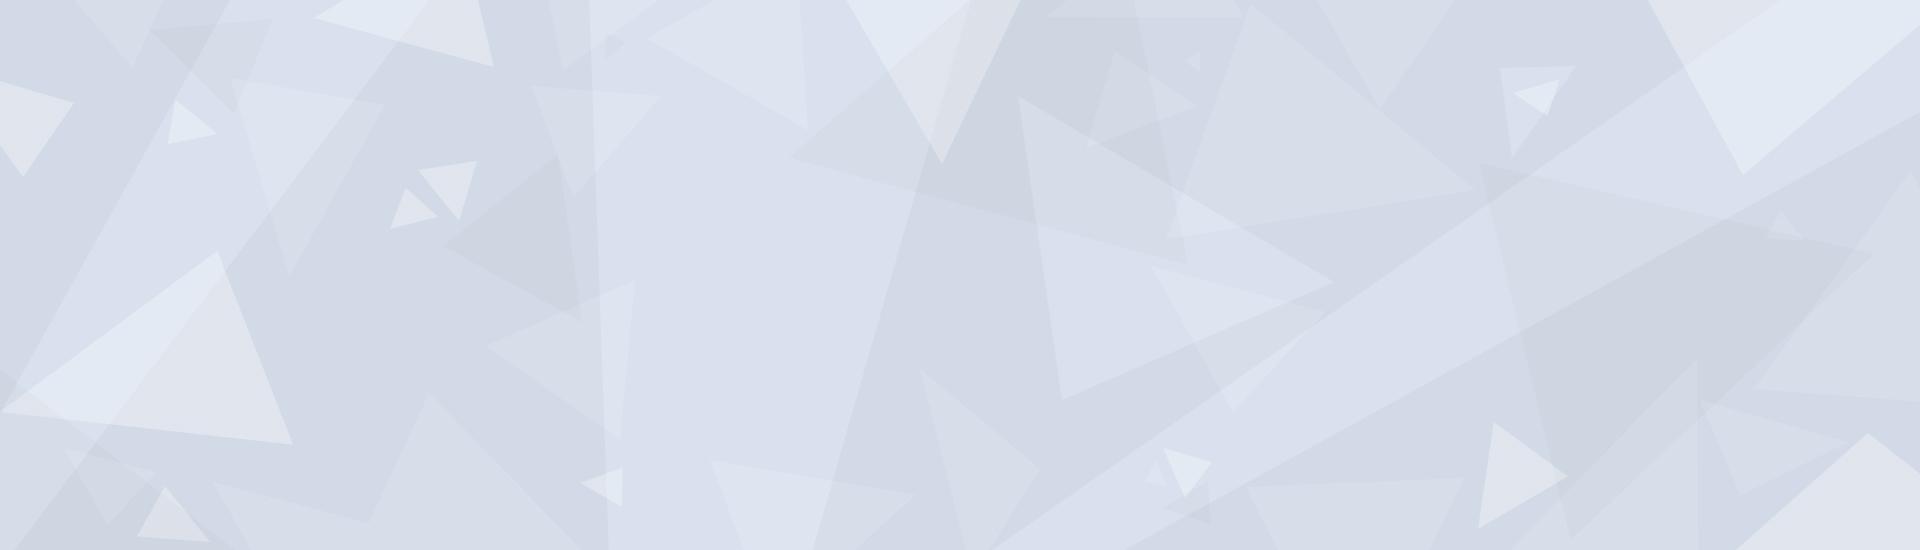 Scal - VSLeague Online eSport